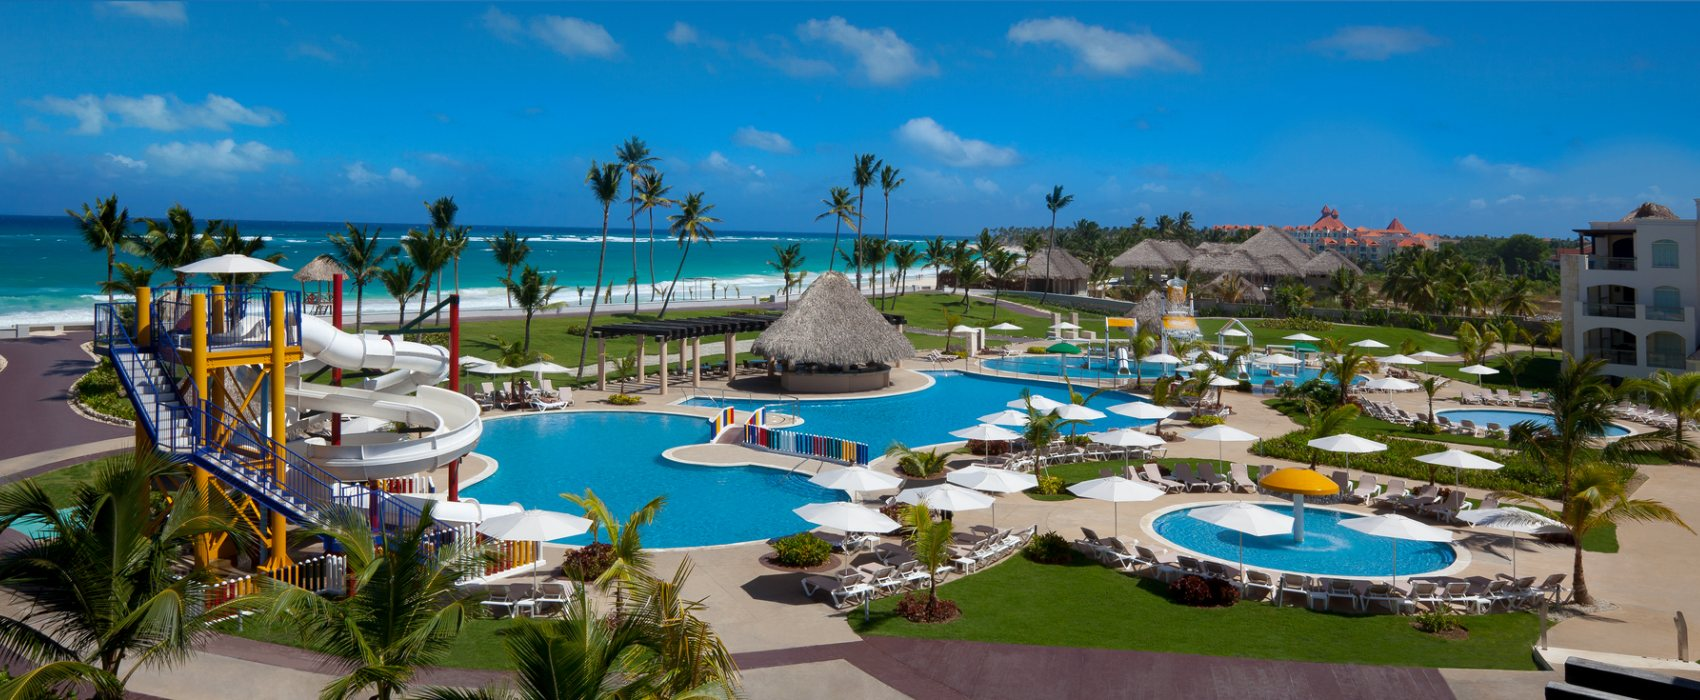 HRHC_Punta_Cana_Family_Pool